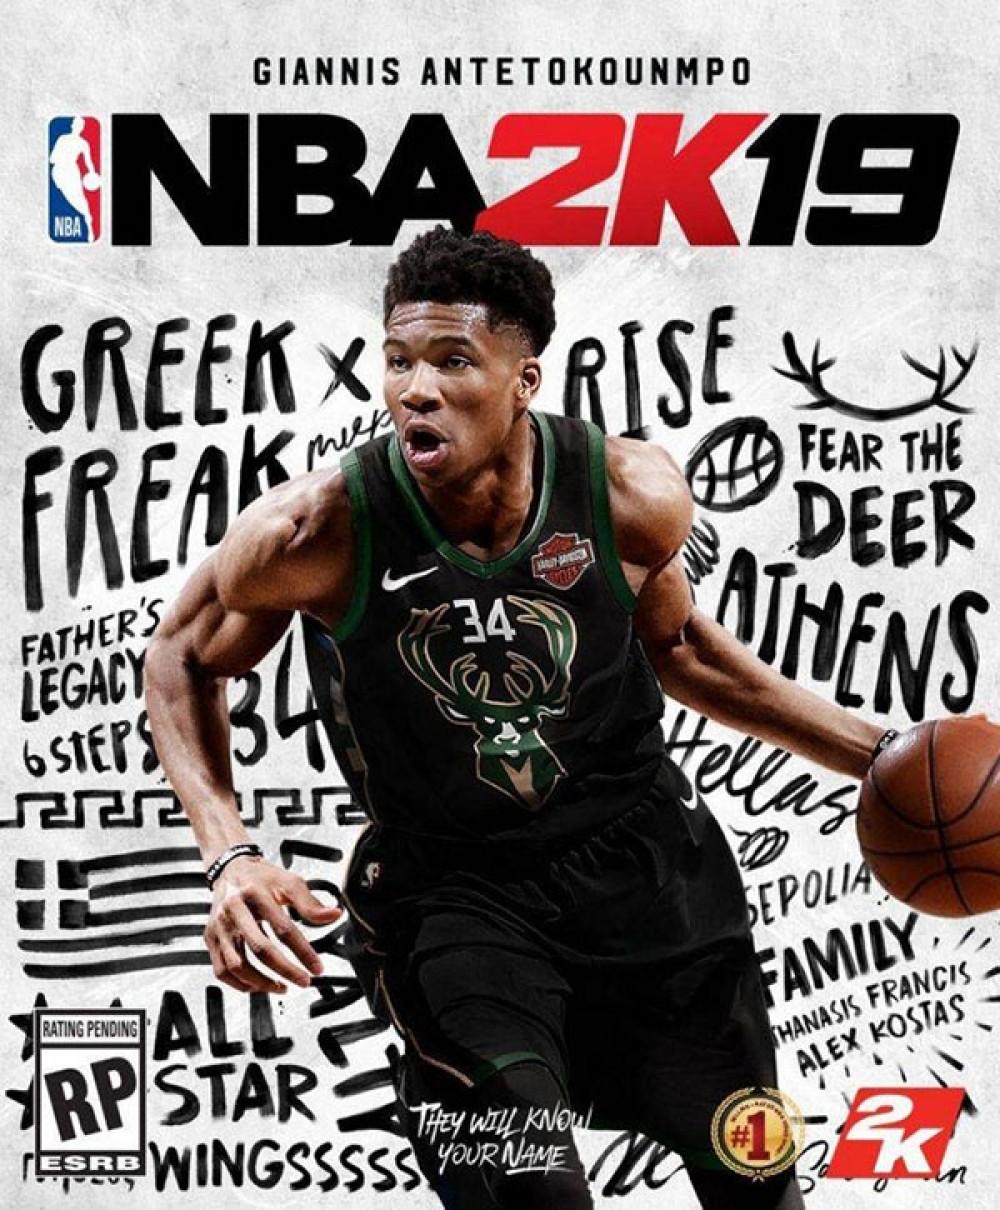 NBA 2K19: Ο Γιάννης Αντετοκούνμπο κοσμεί το εξώφυλλο του παιχνιδιού! [Video]